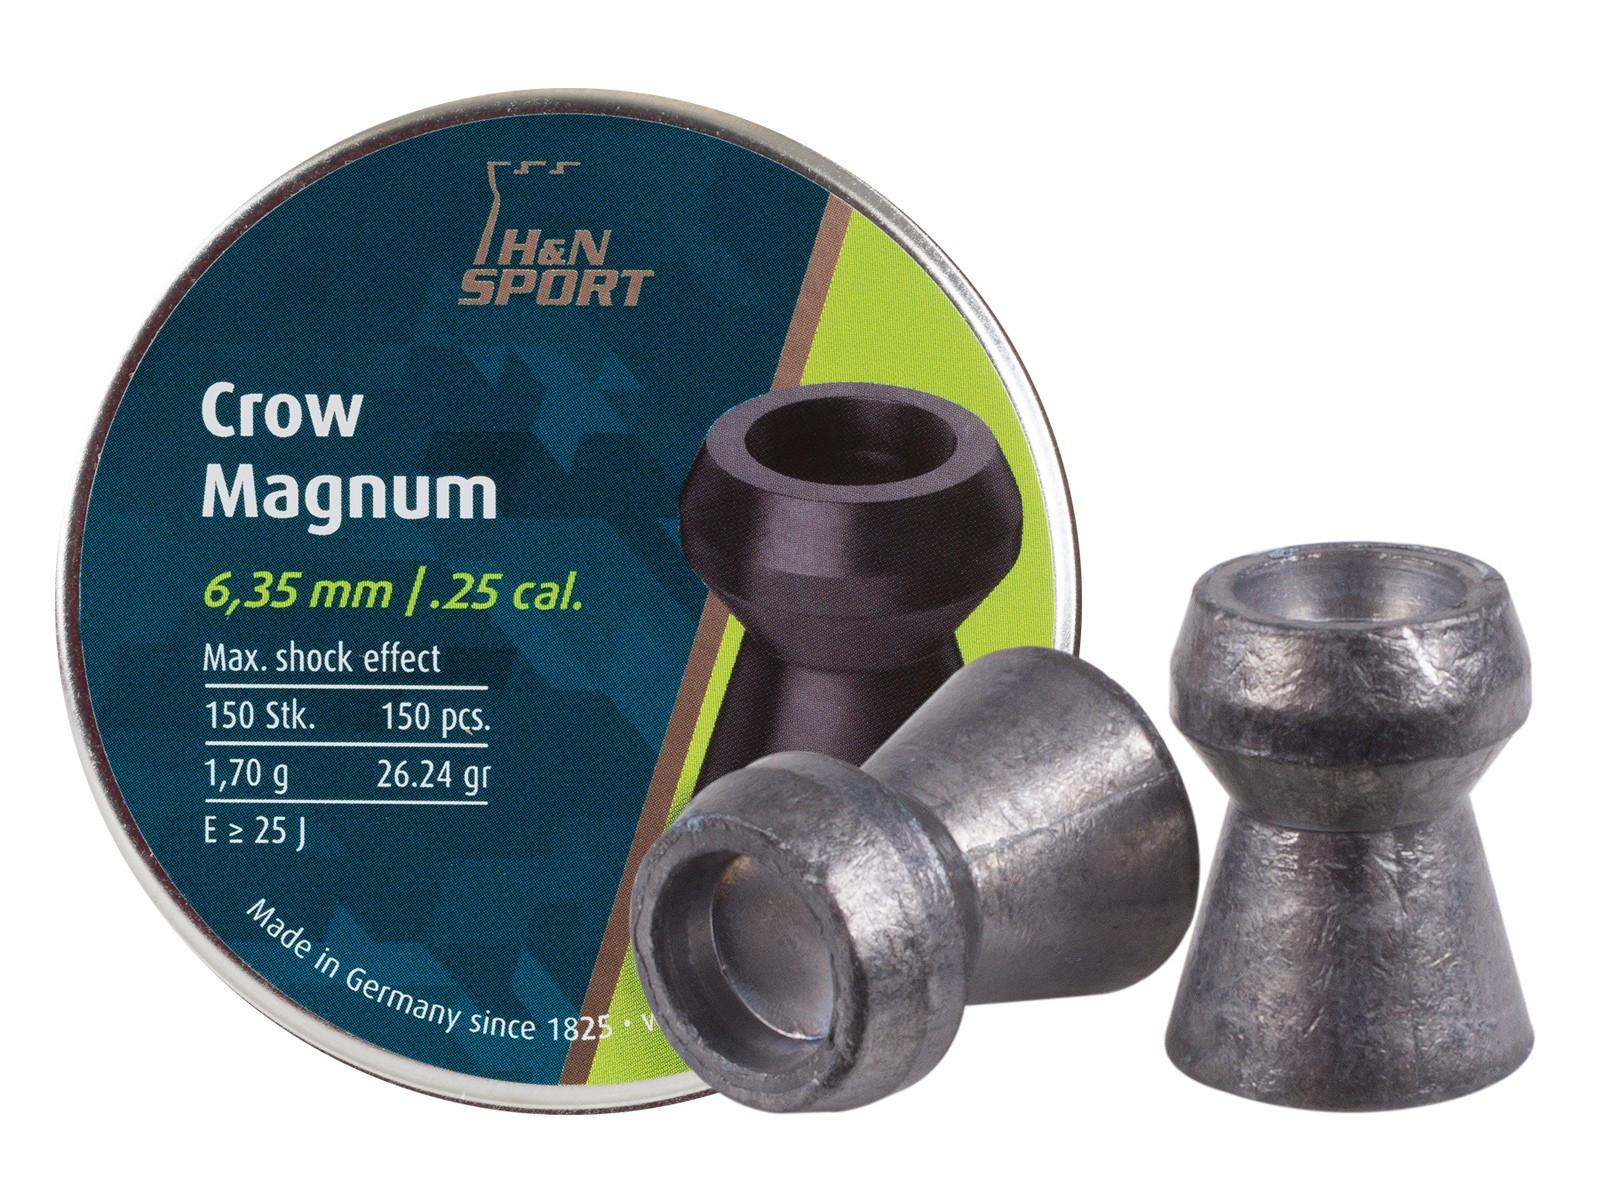 H&N Crow Magnum .25 Cal, 26.24 gr - 150 ct